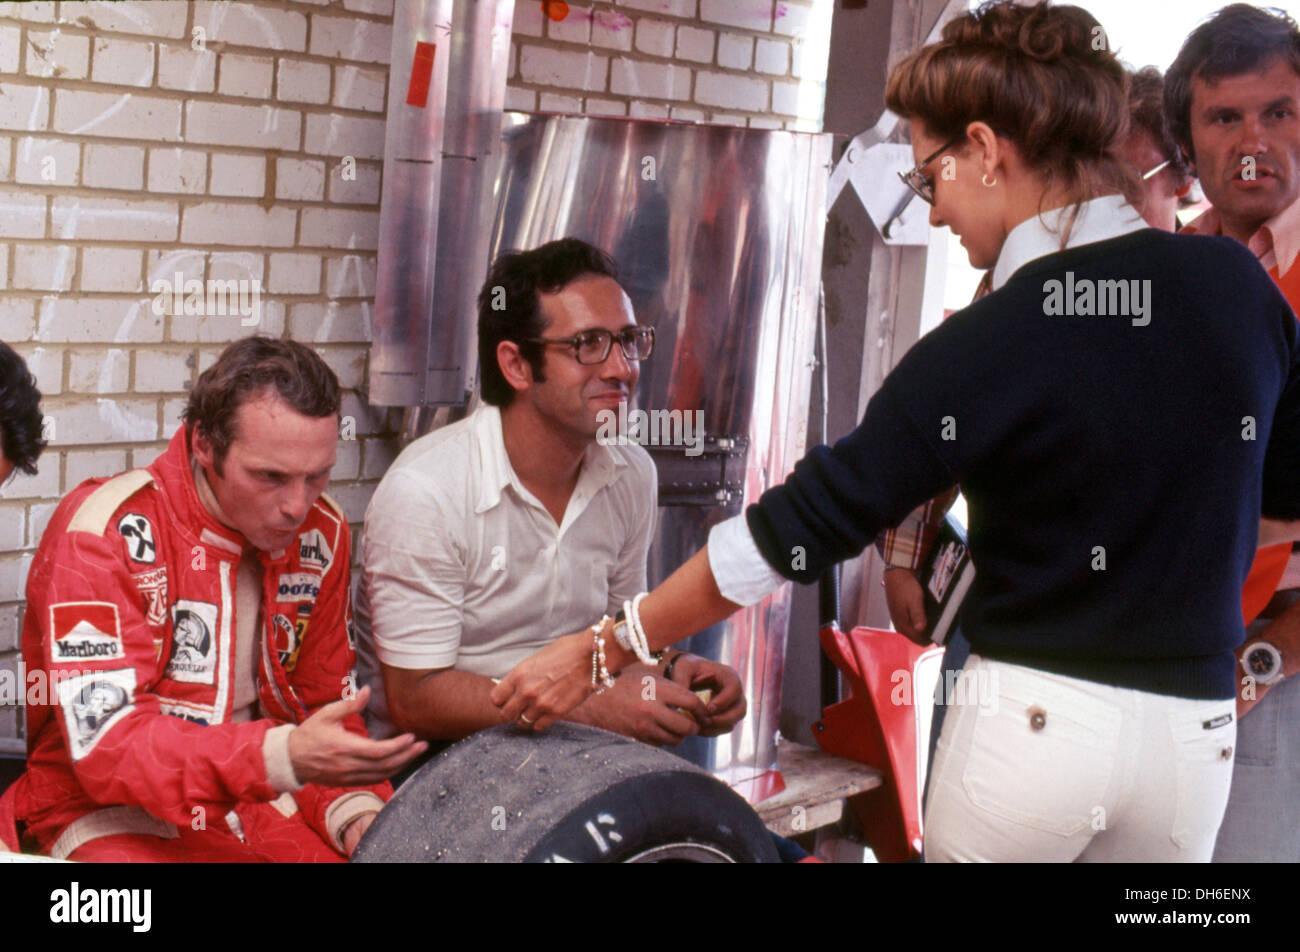 Niki Lauda With His Wife Marlene And Mauro Forghieri